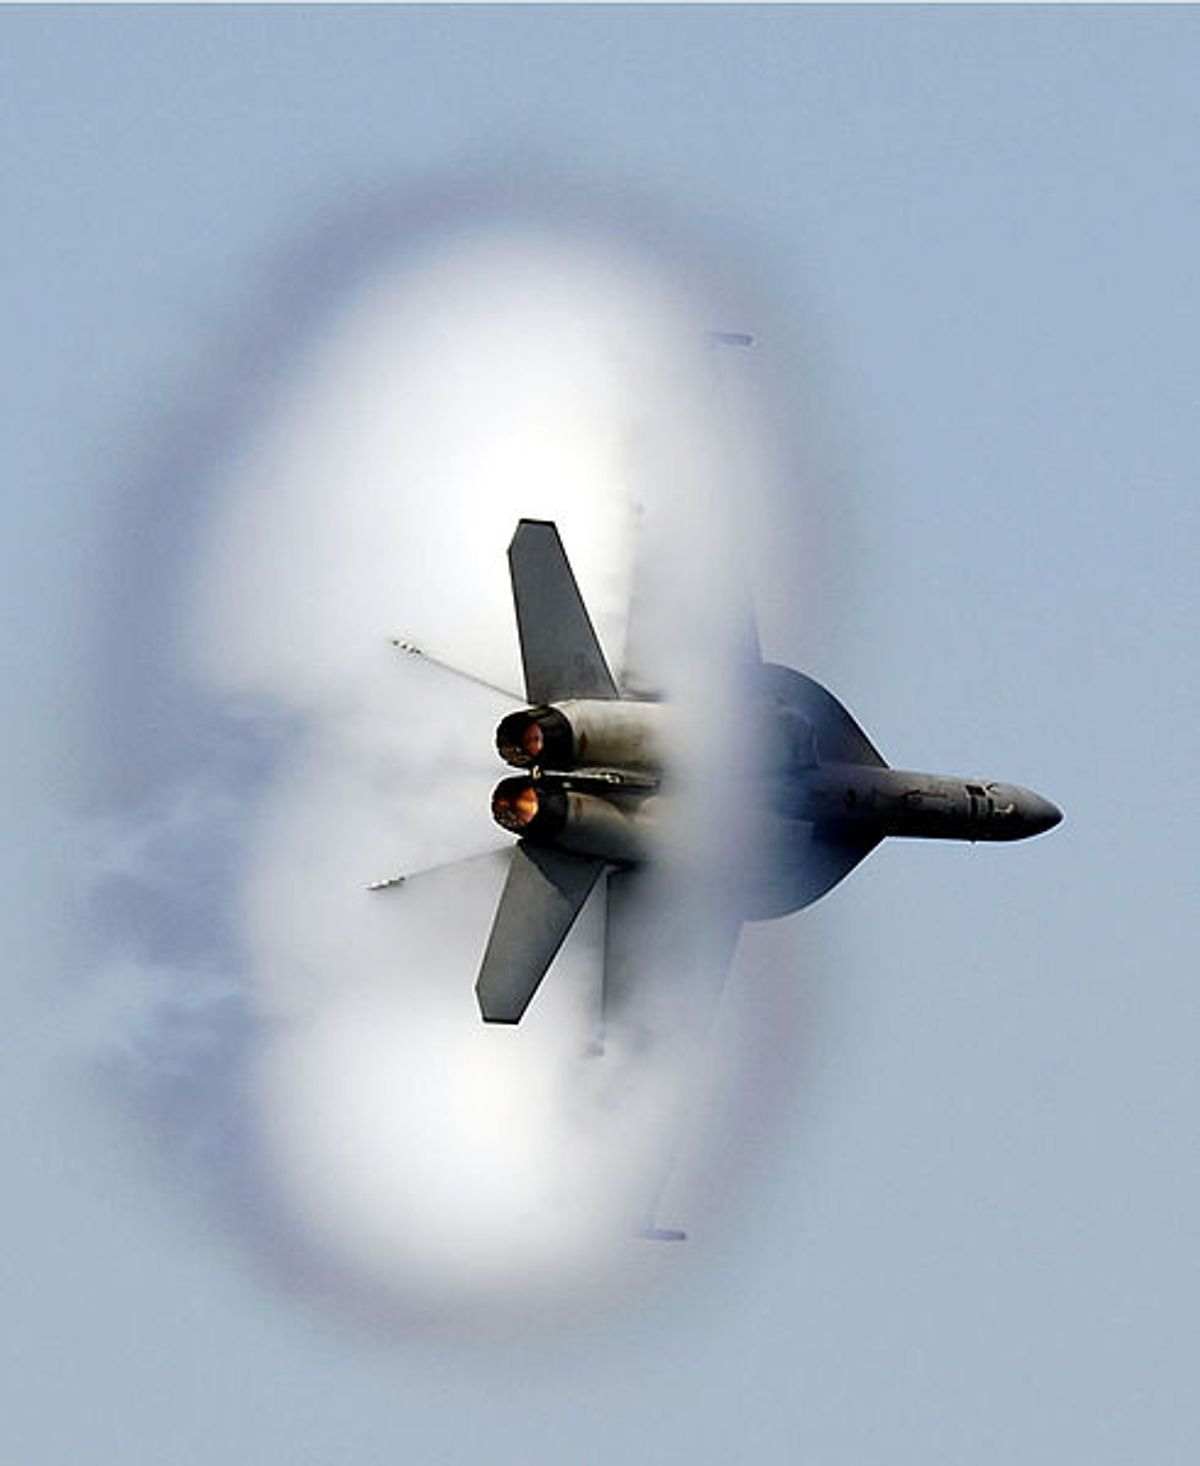 (U.S. Navy photo by Mass Communication Specialist 3rd Class Jarod Hodge)